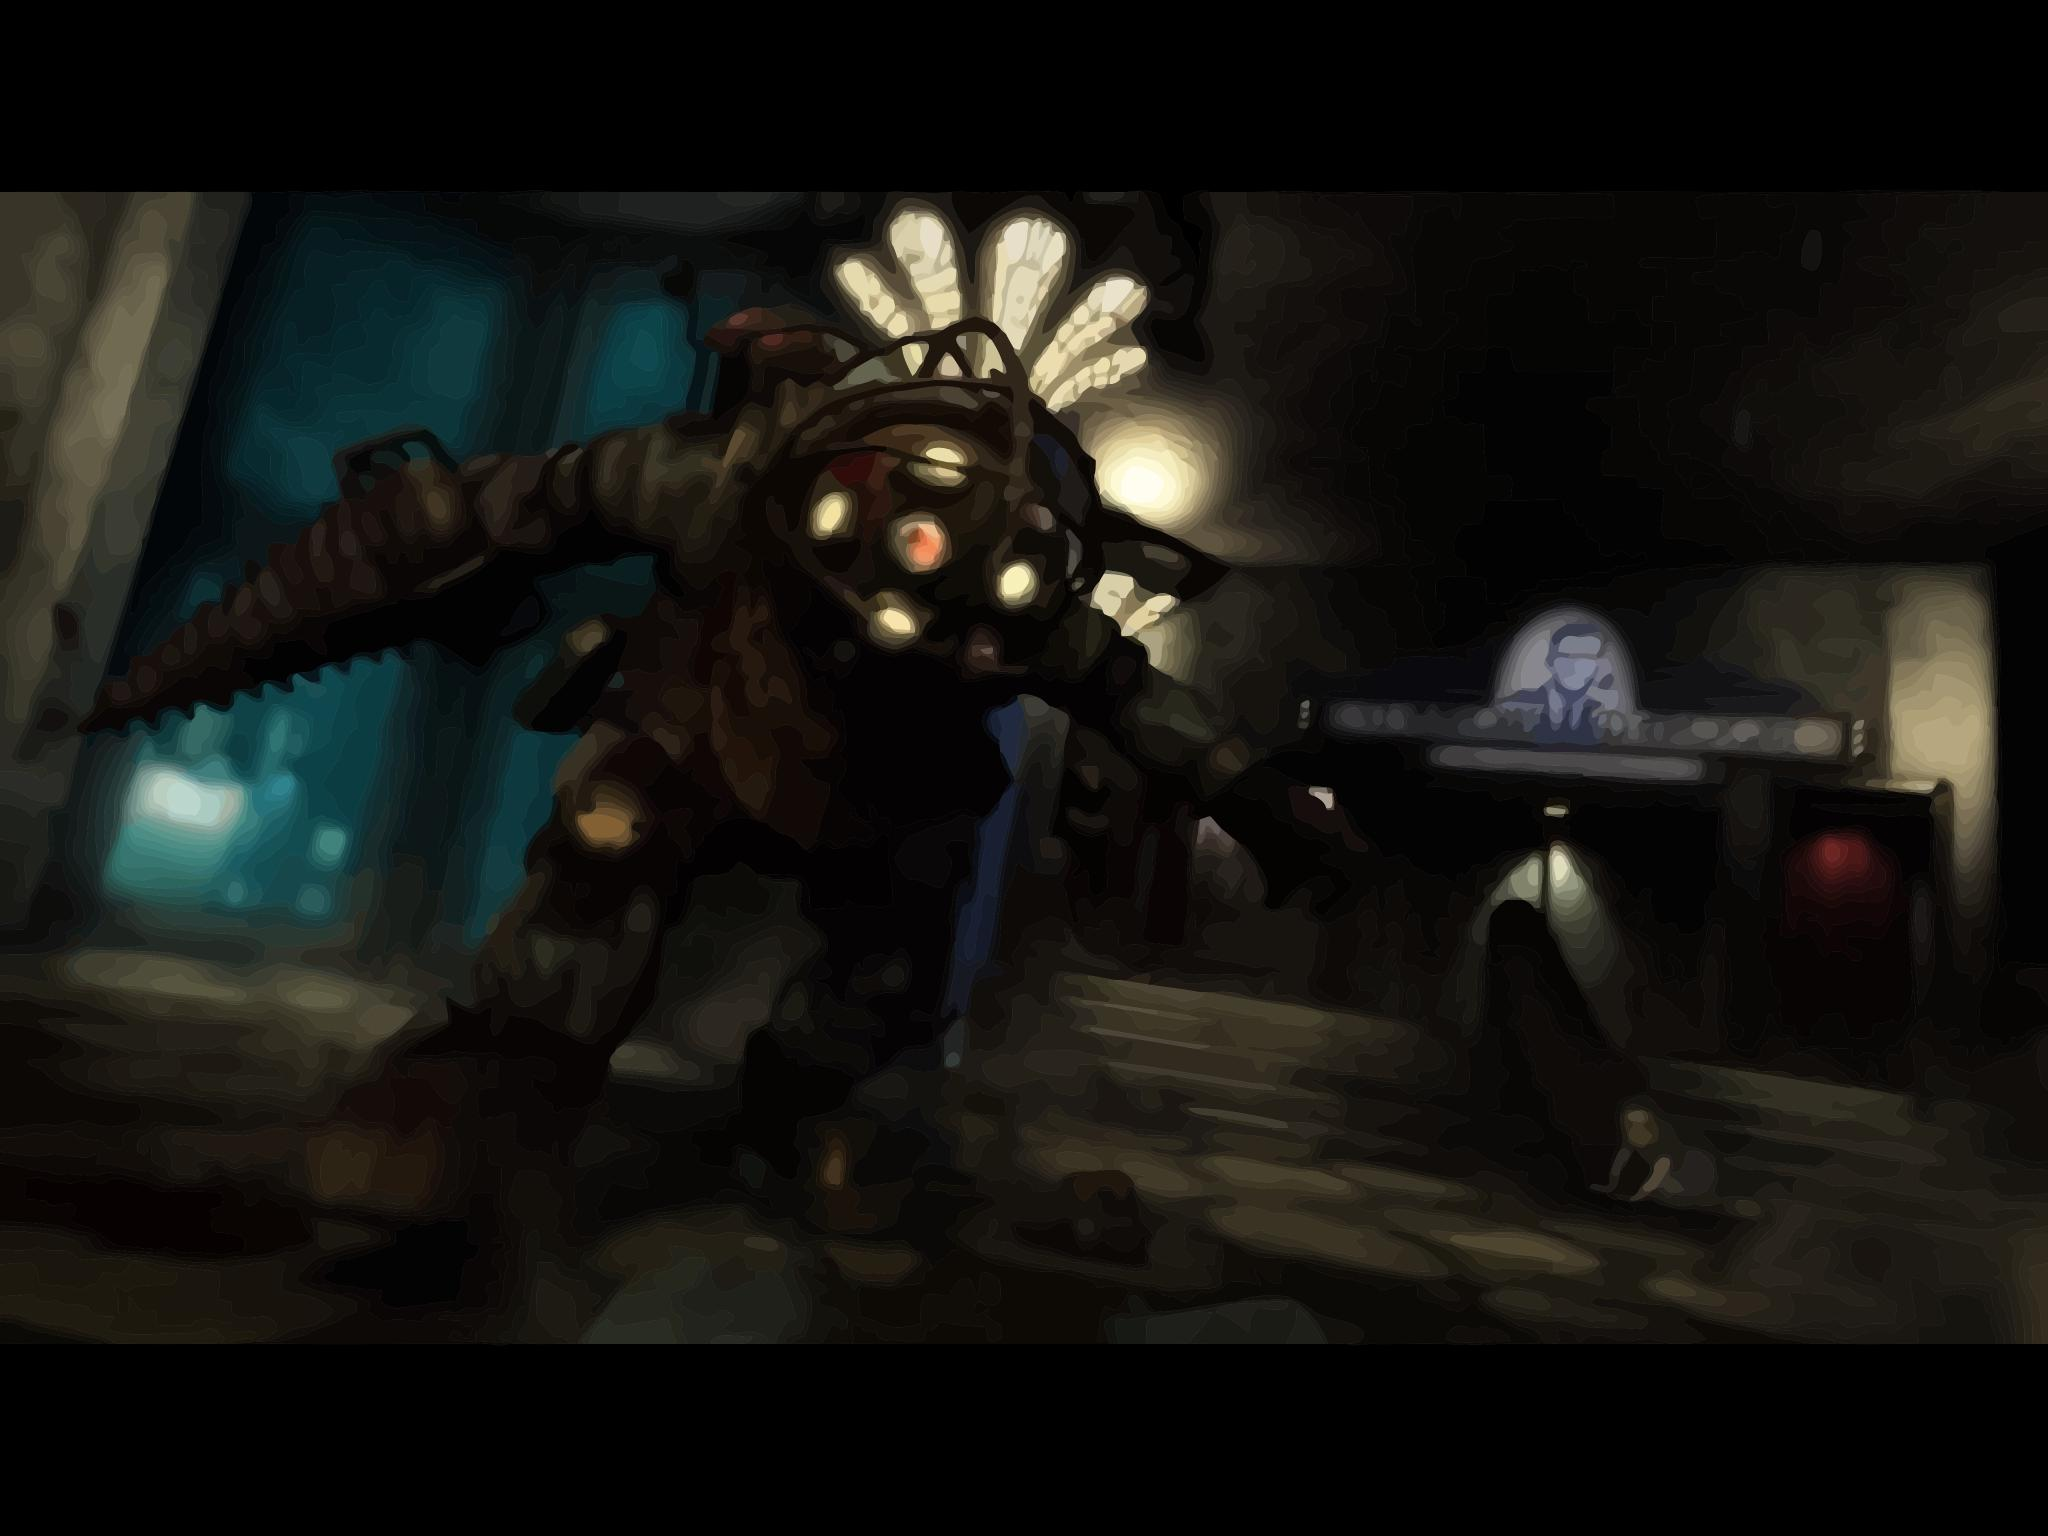 Vector - Bouncer Big Daddy 'Bioshock' by TheMidknightStar